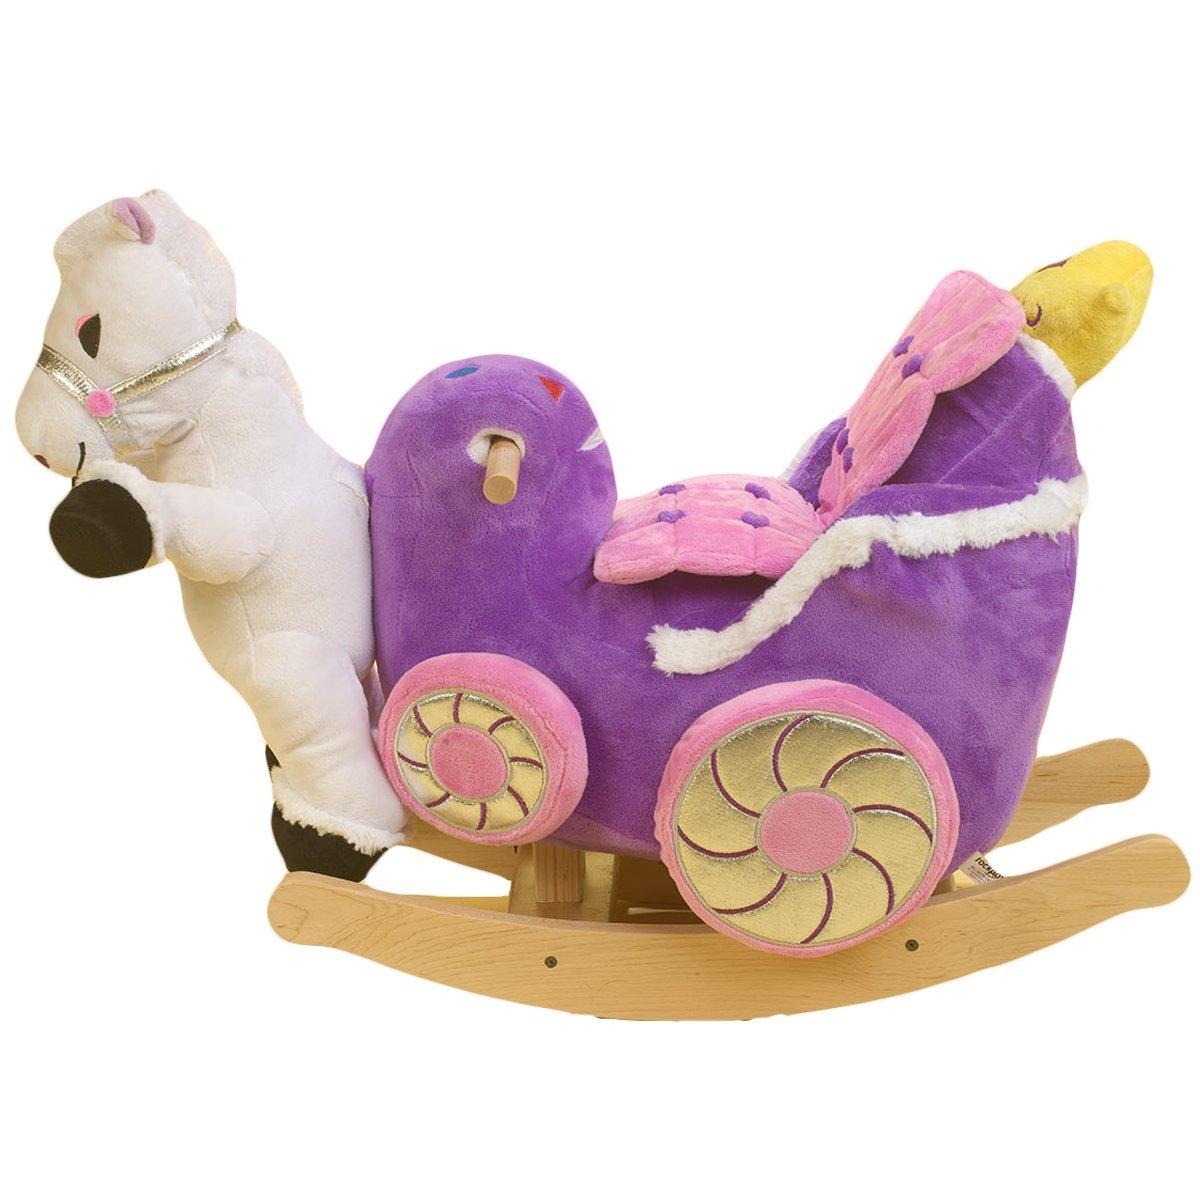 Rockabye Princess Carriage Rocker, Multi 85032